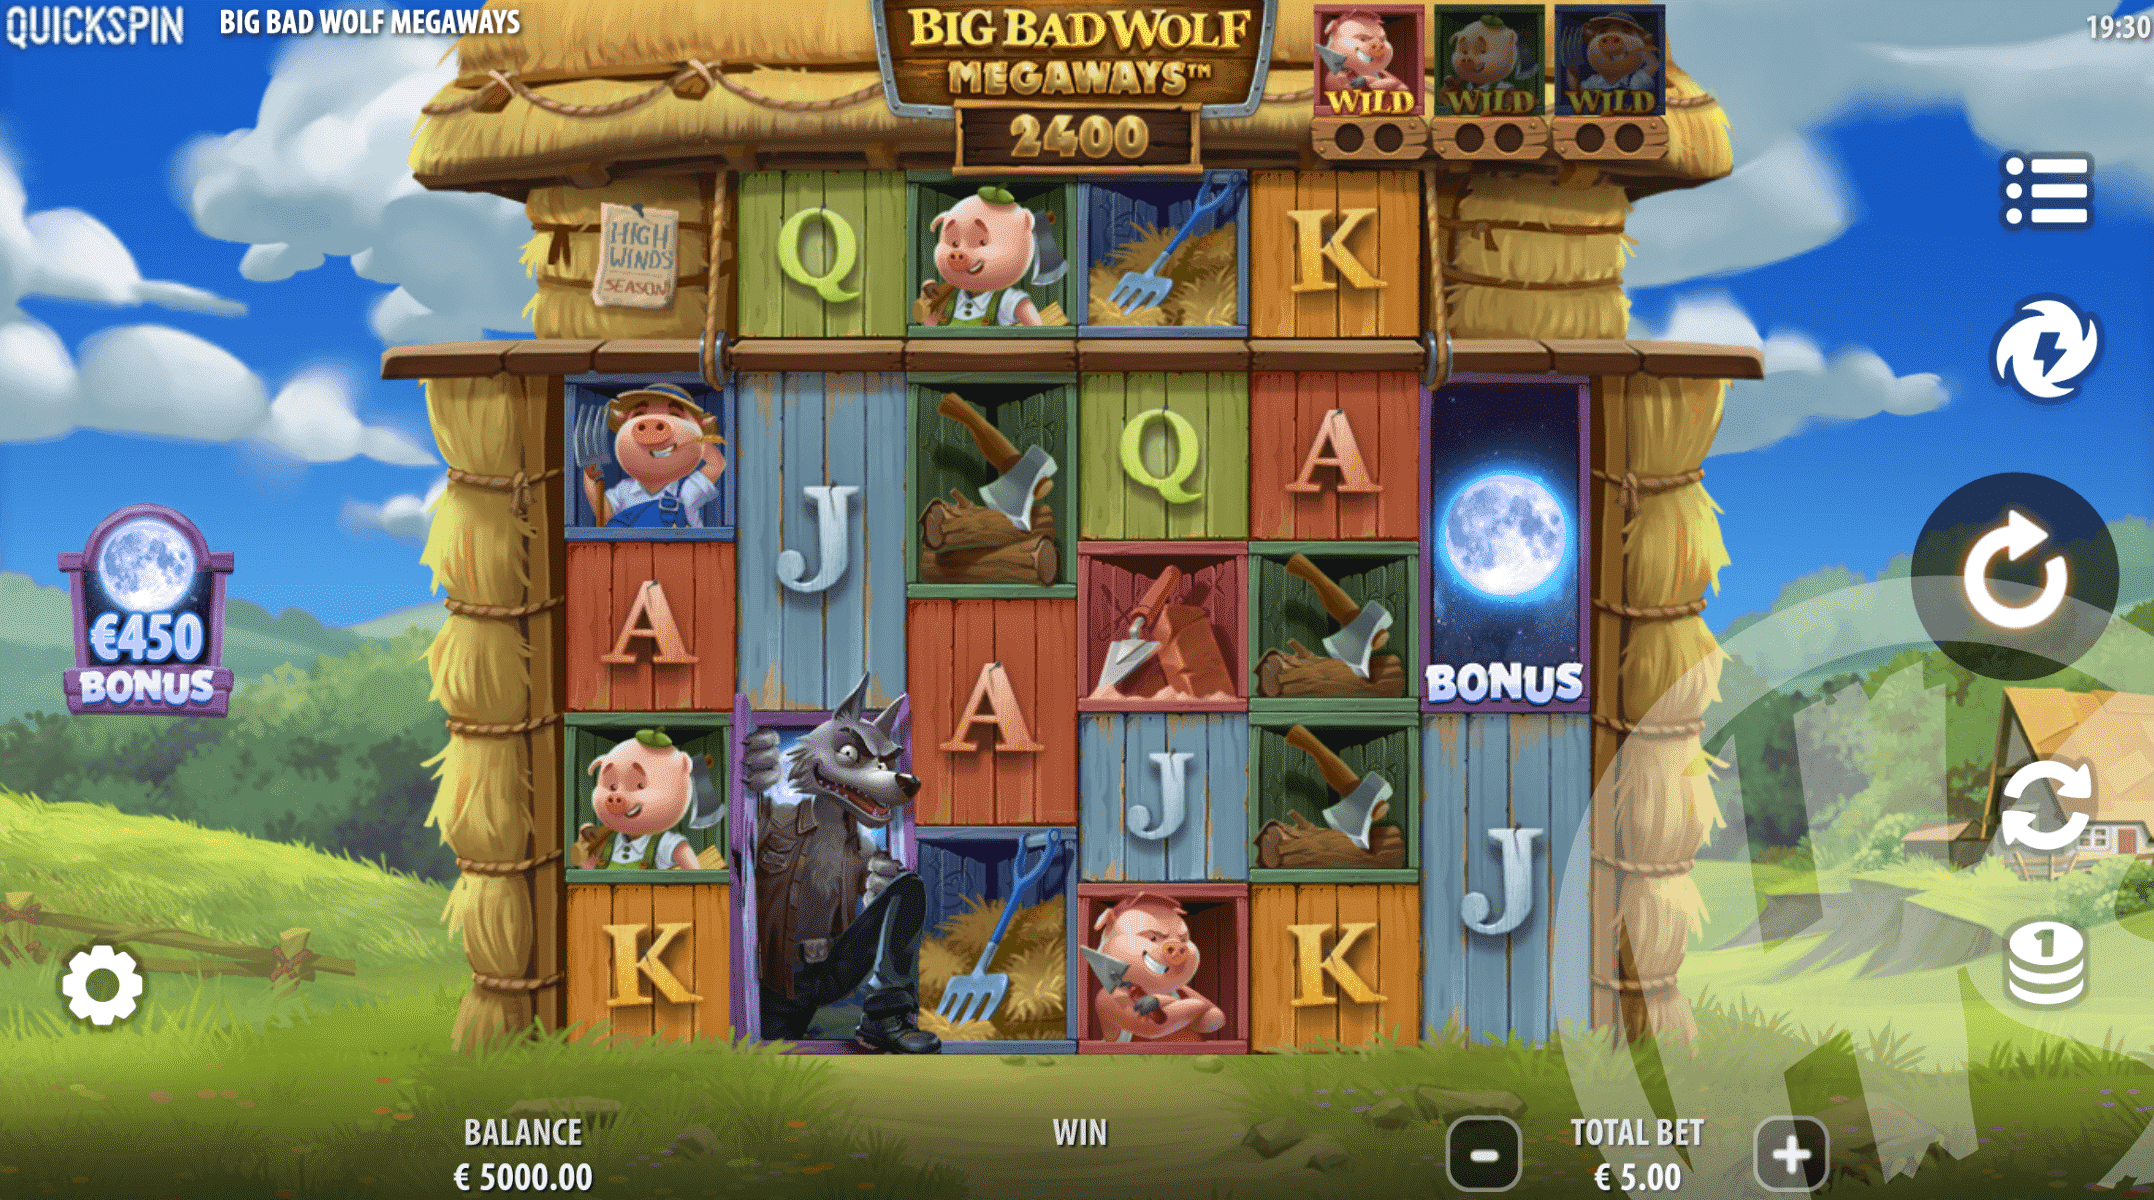 Big Bad Wolf Megaways Base Game